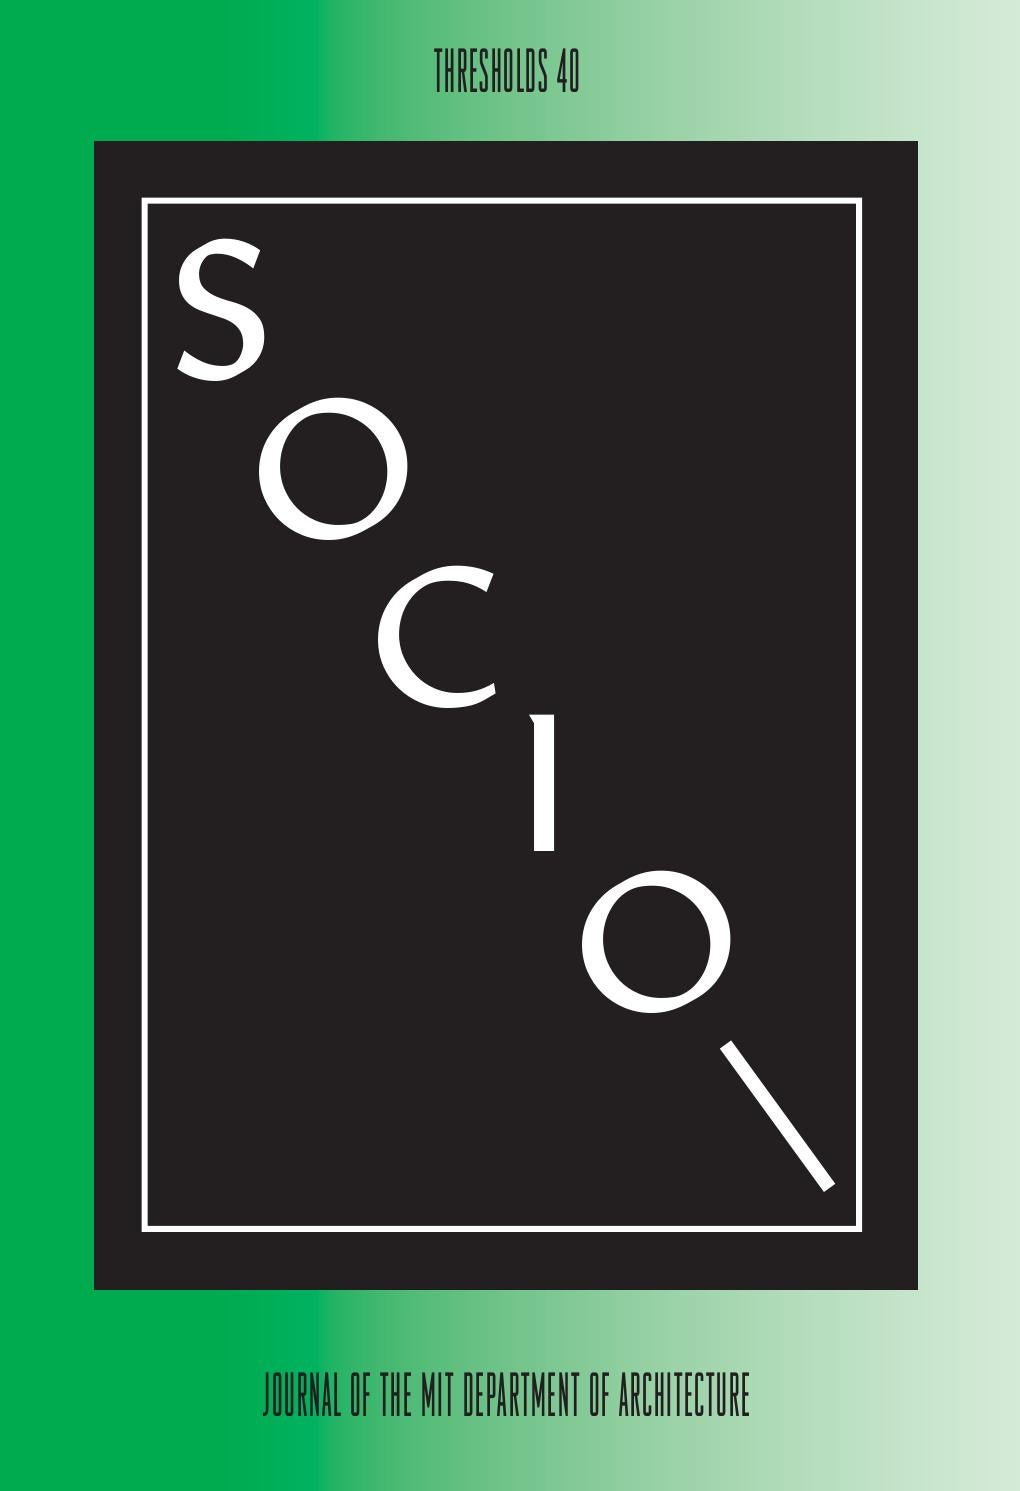 Thresholds 40 Socio By Jonathan Jae An Crisman Issuu